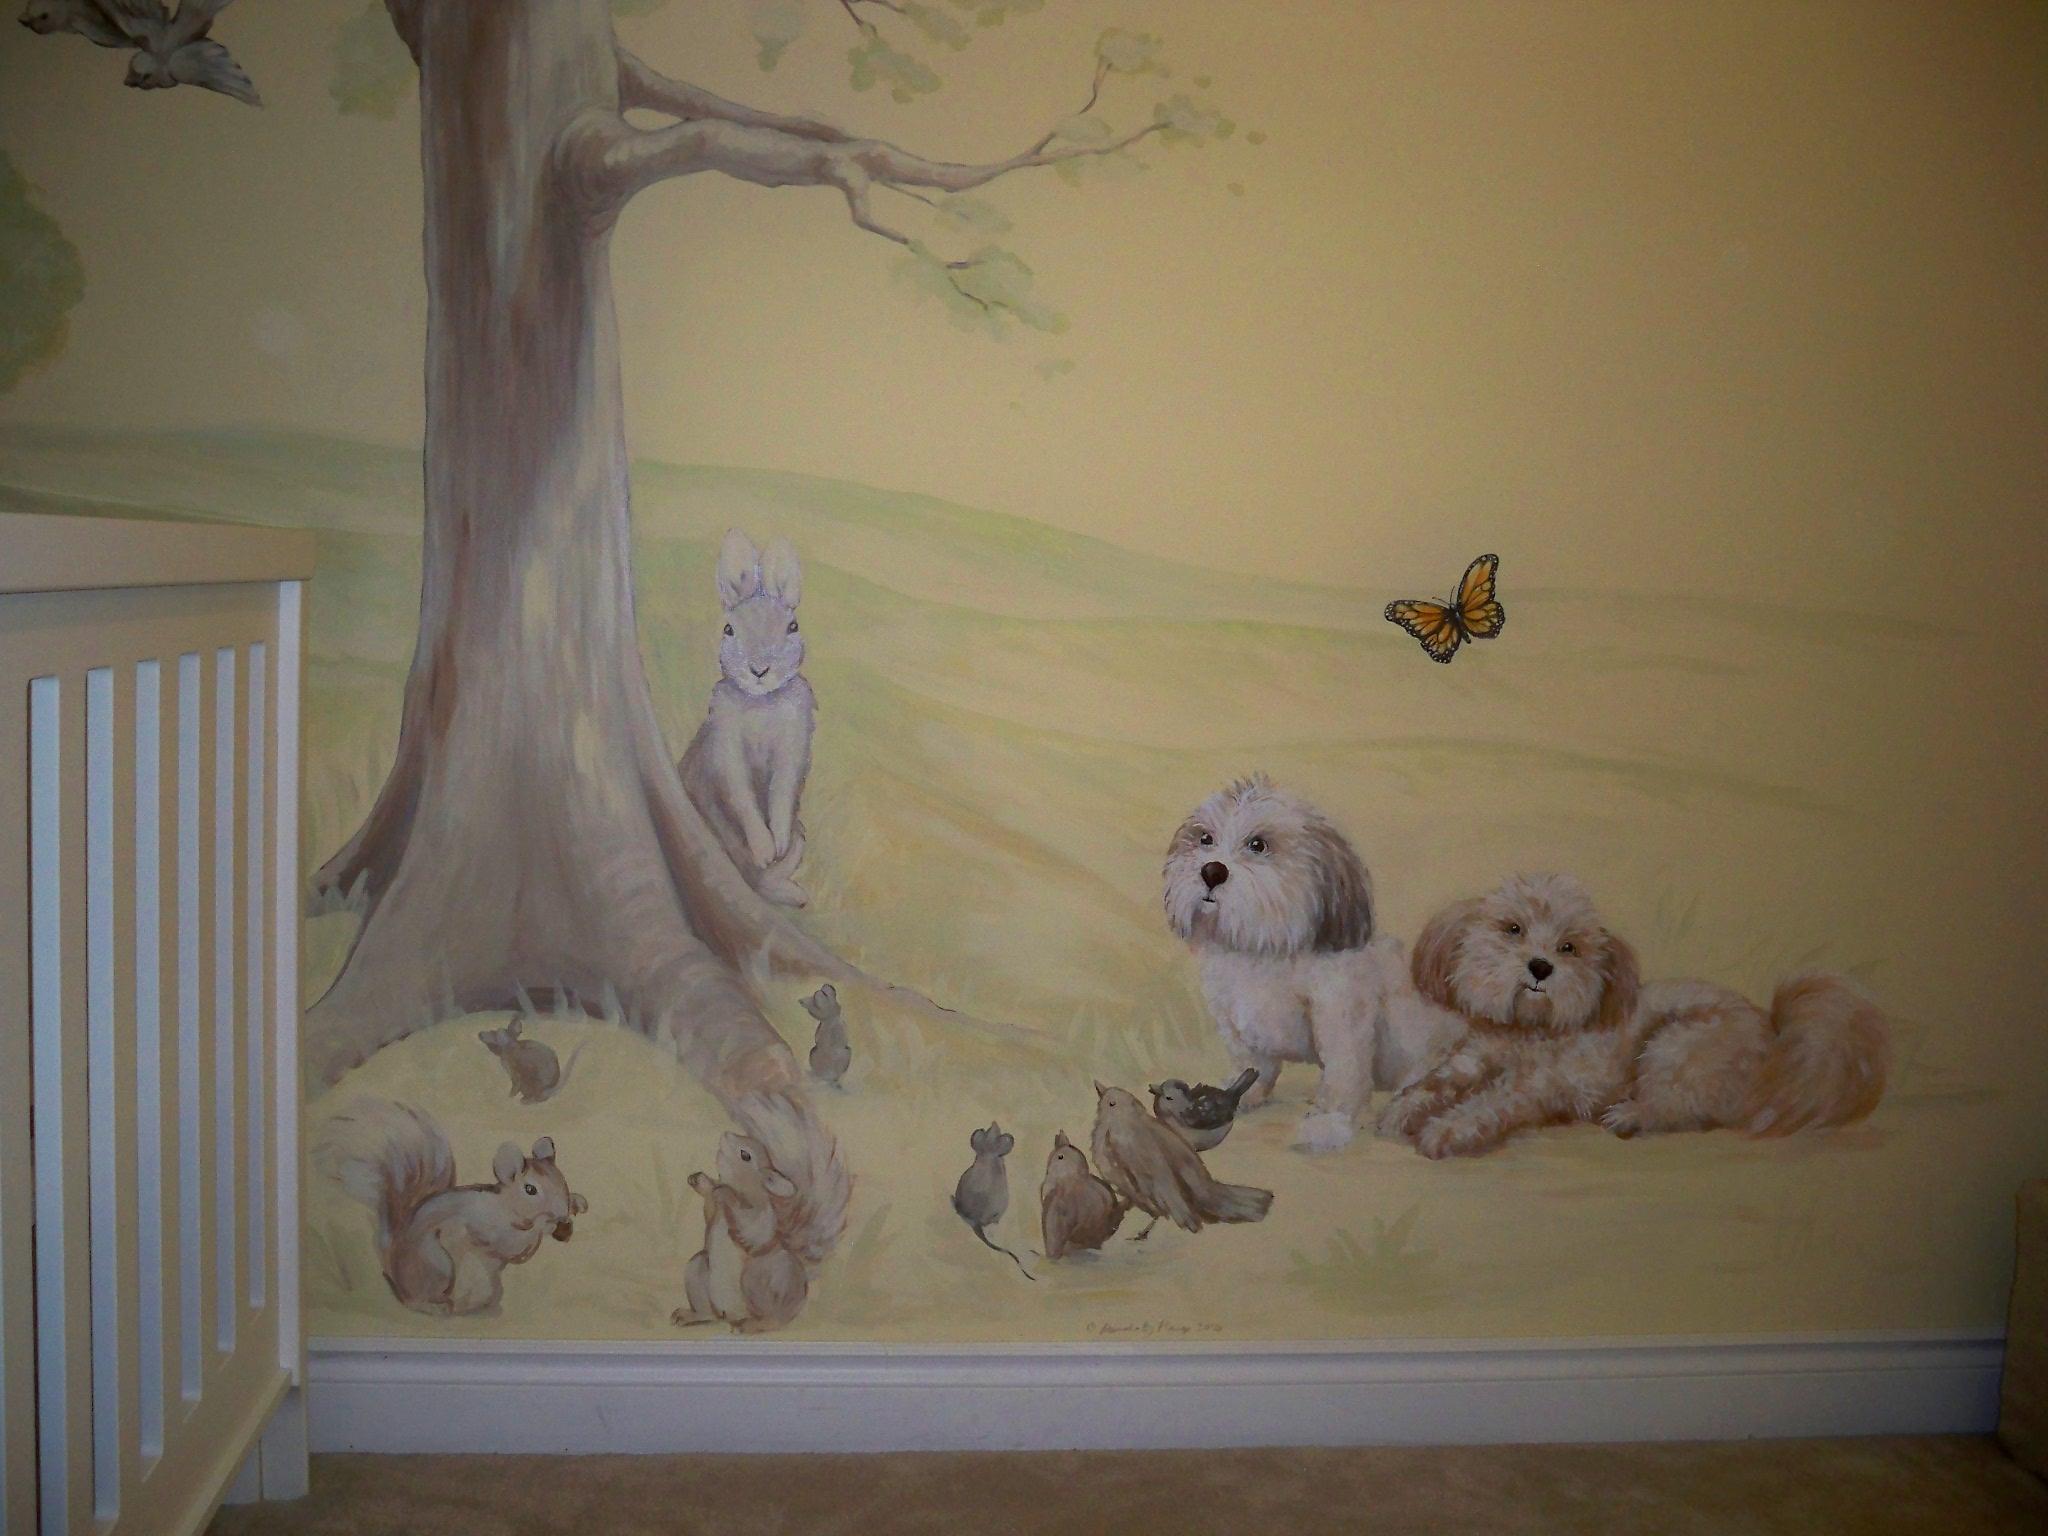 Murals By Marg Kayla's Nursery Mural 2